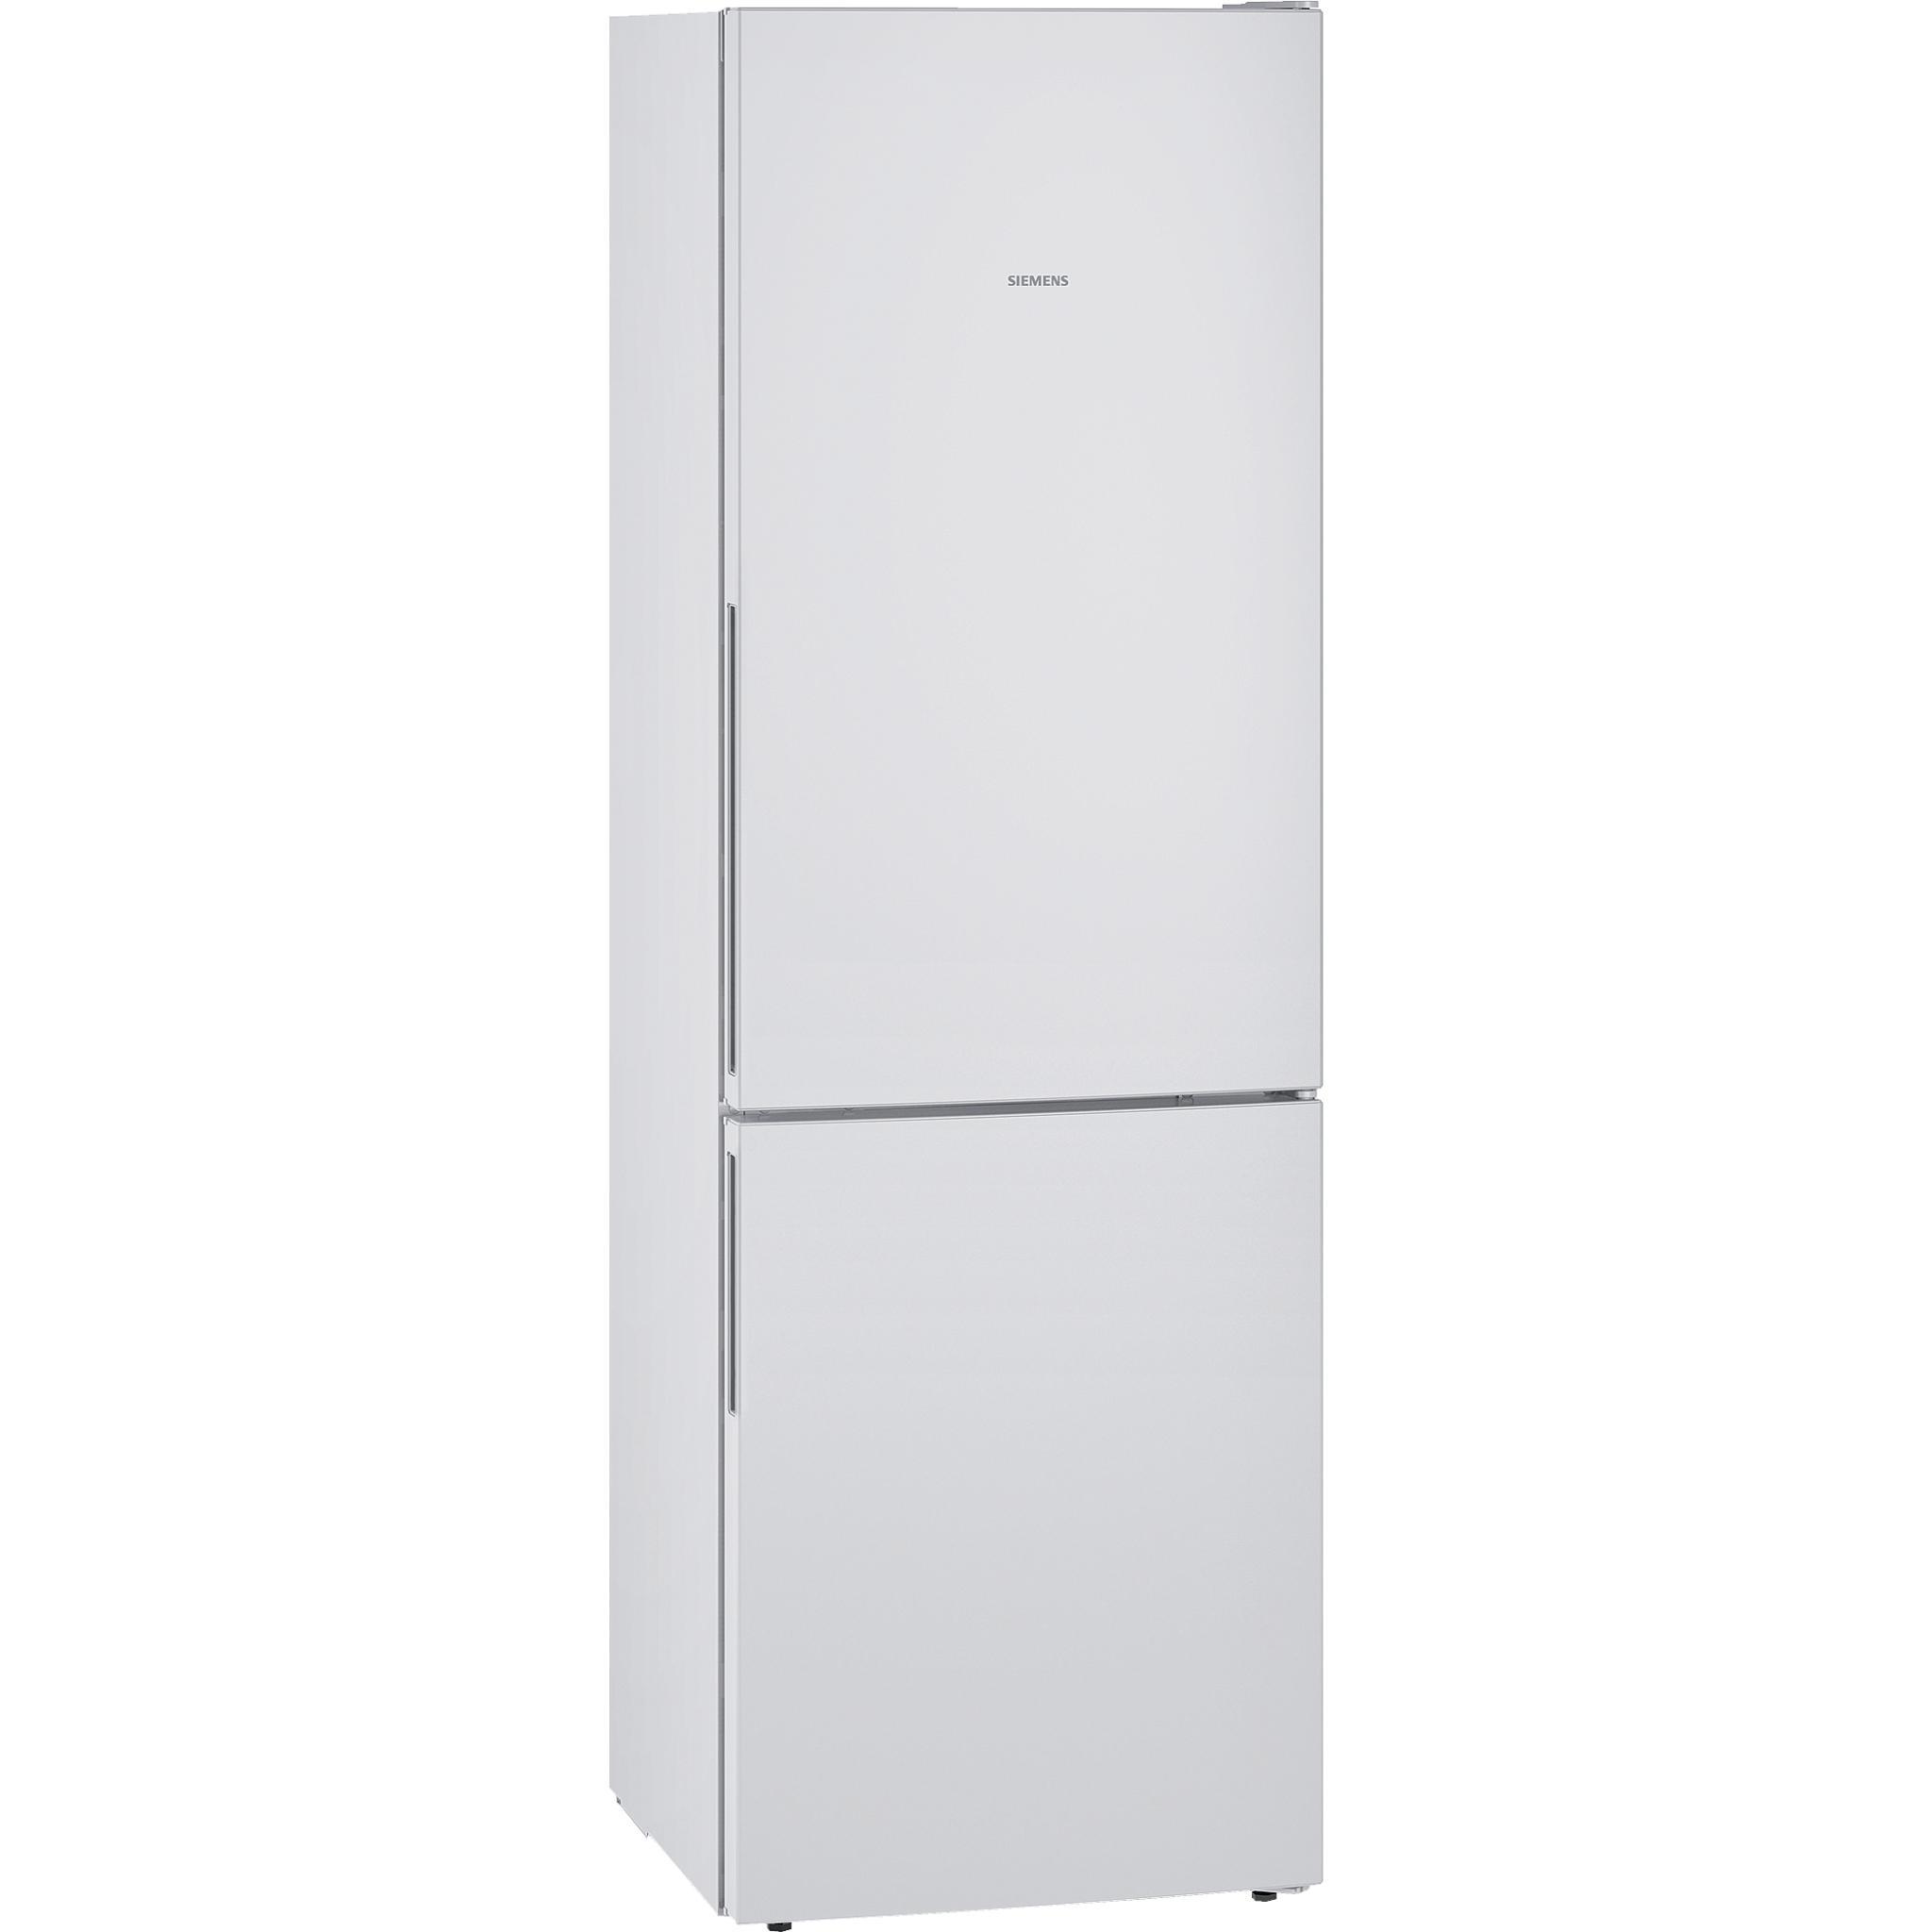 siemens-iq300-kg36vvw33g-low-frost-fridge-freezer